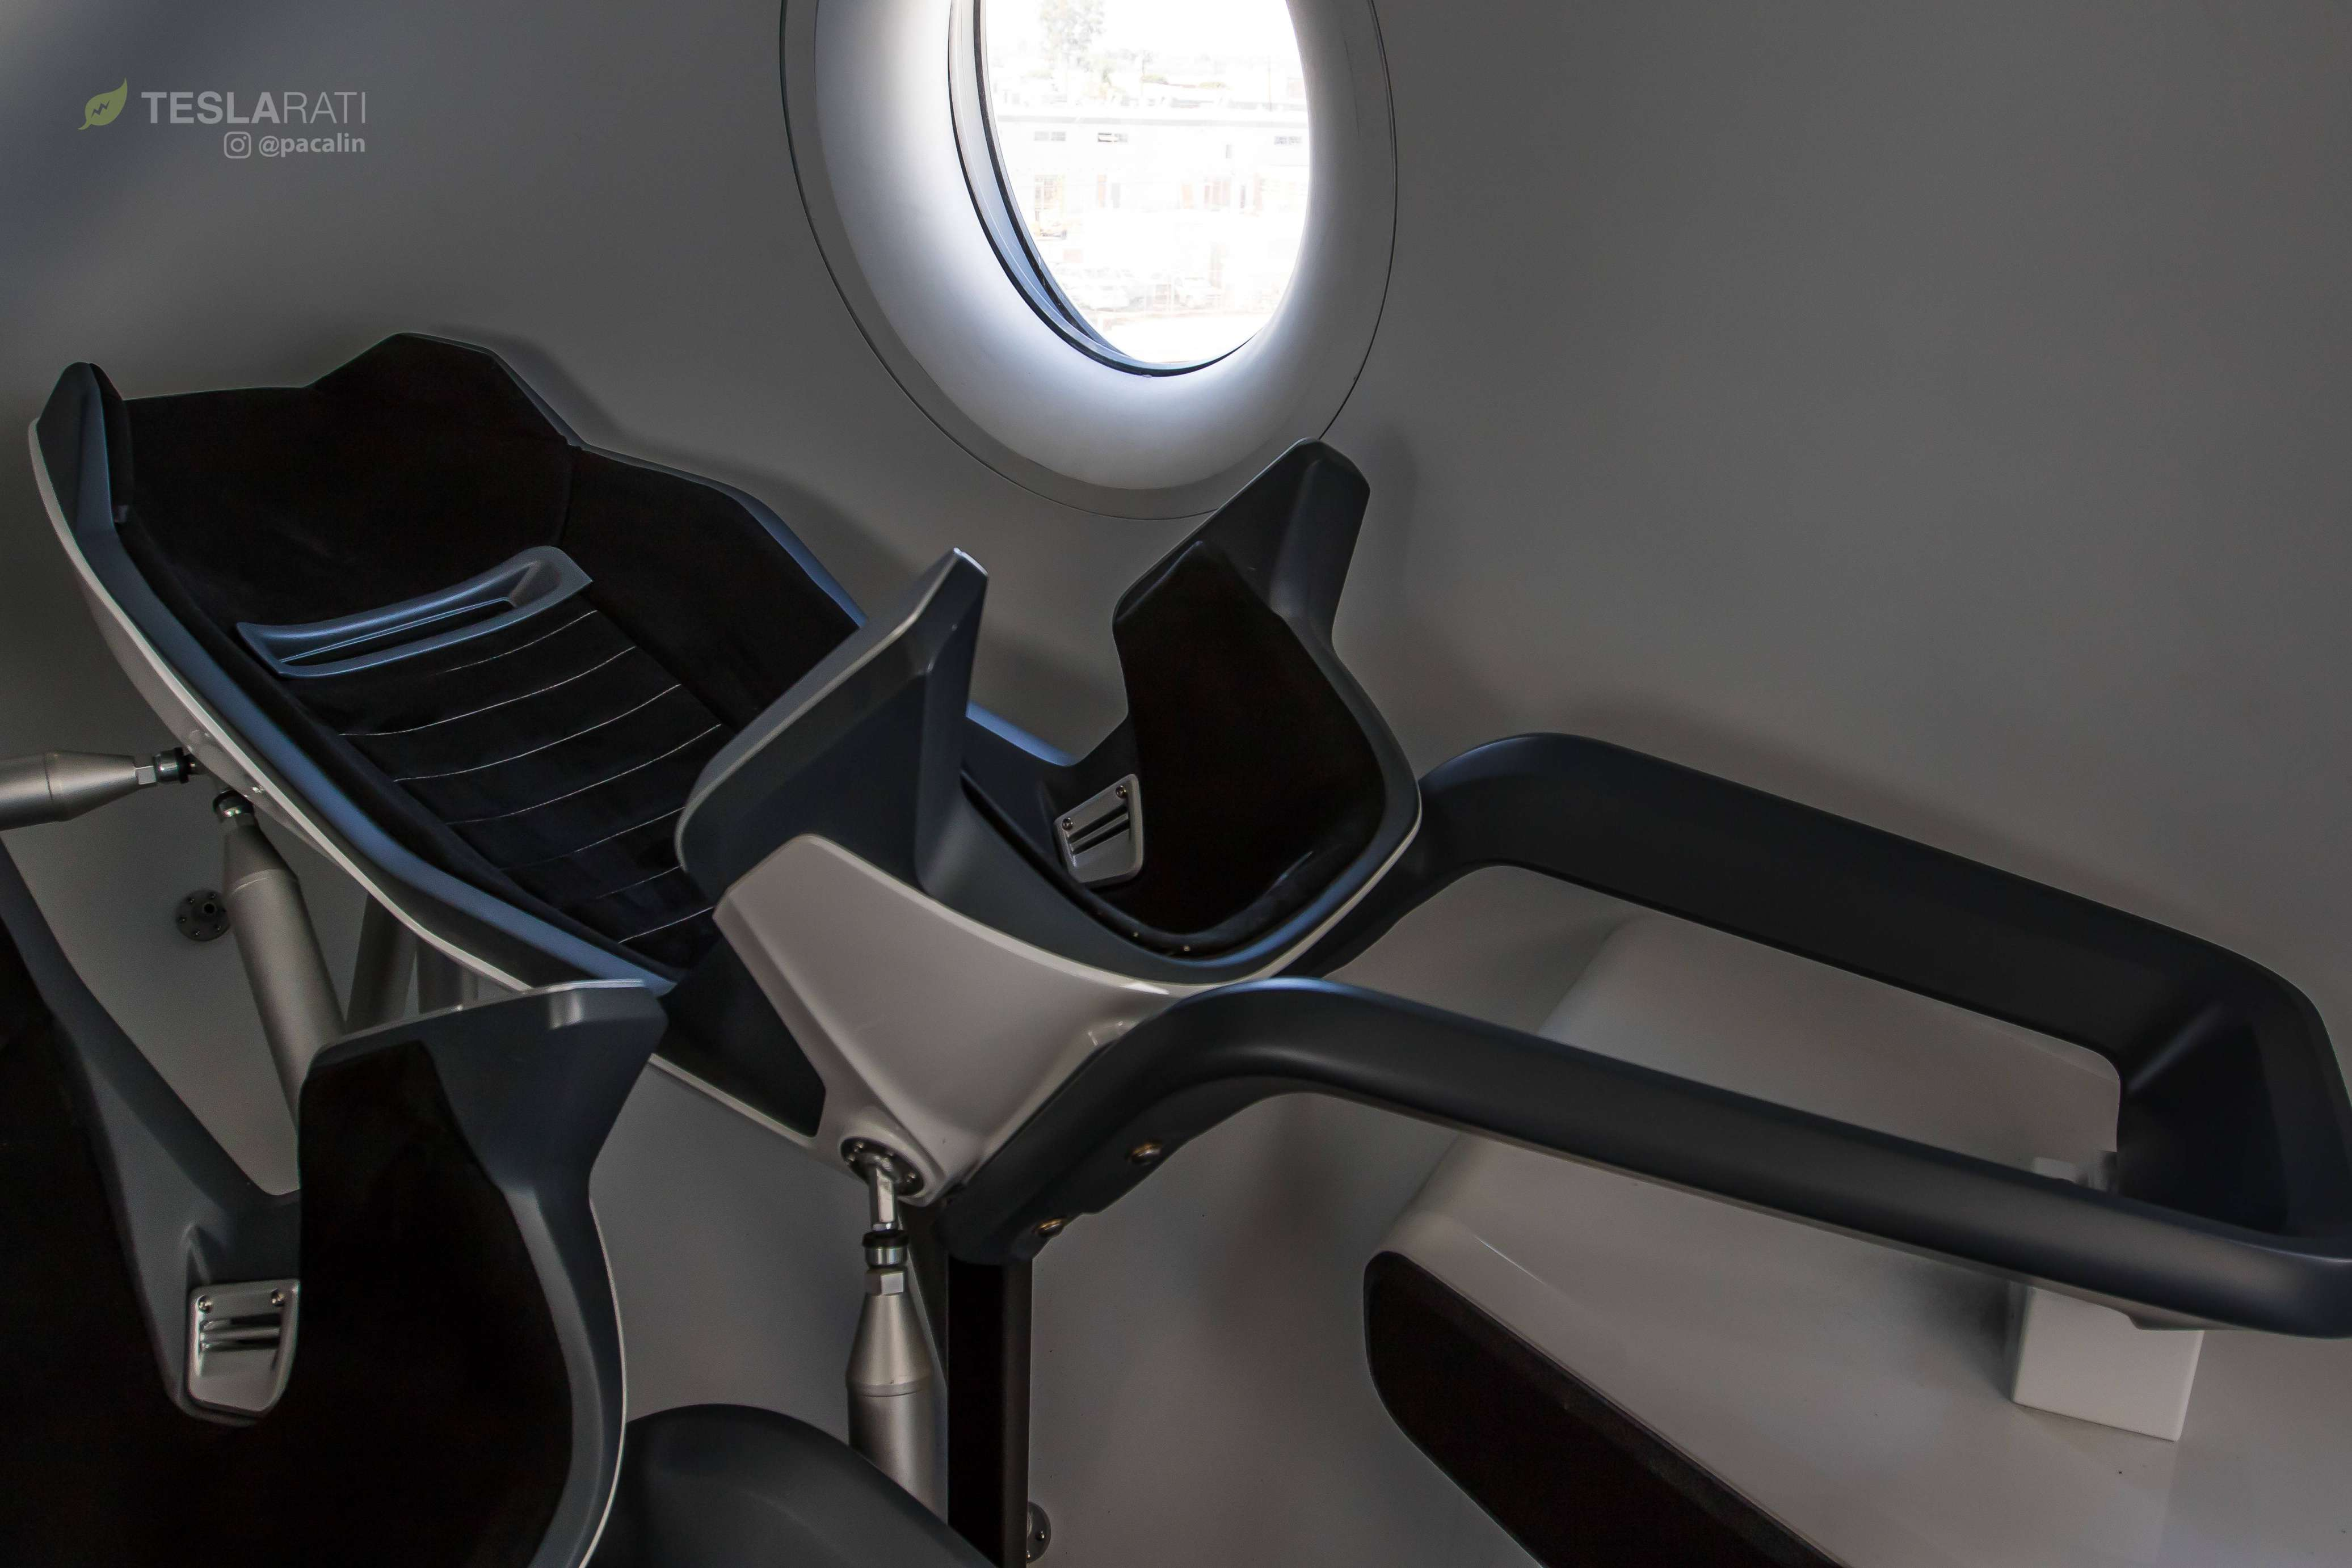 Crew Dragon simulator cabin 081318 (SpaceX) 1 (c)